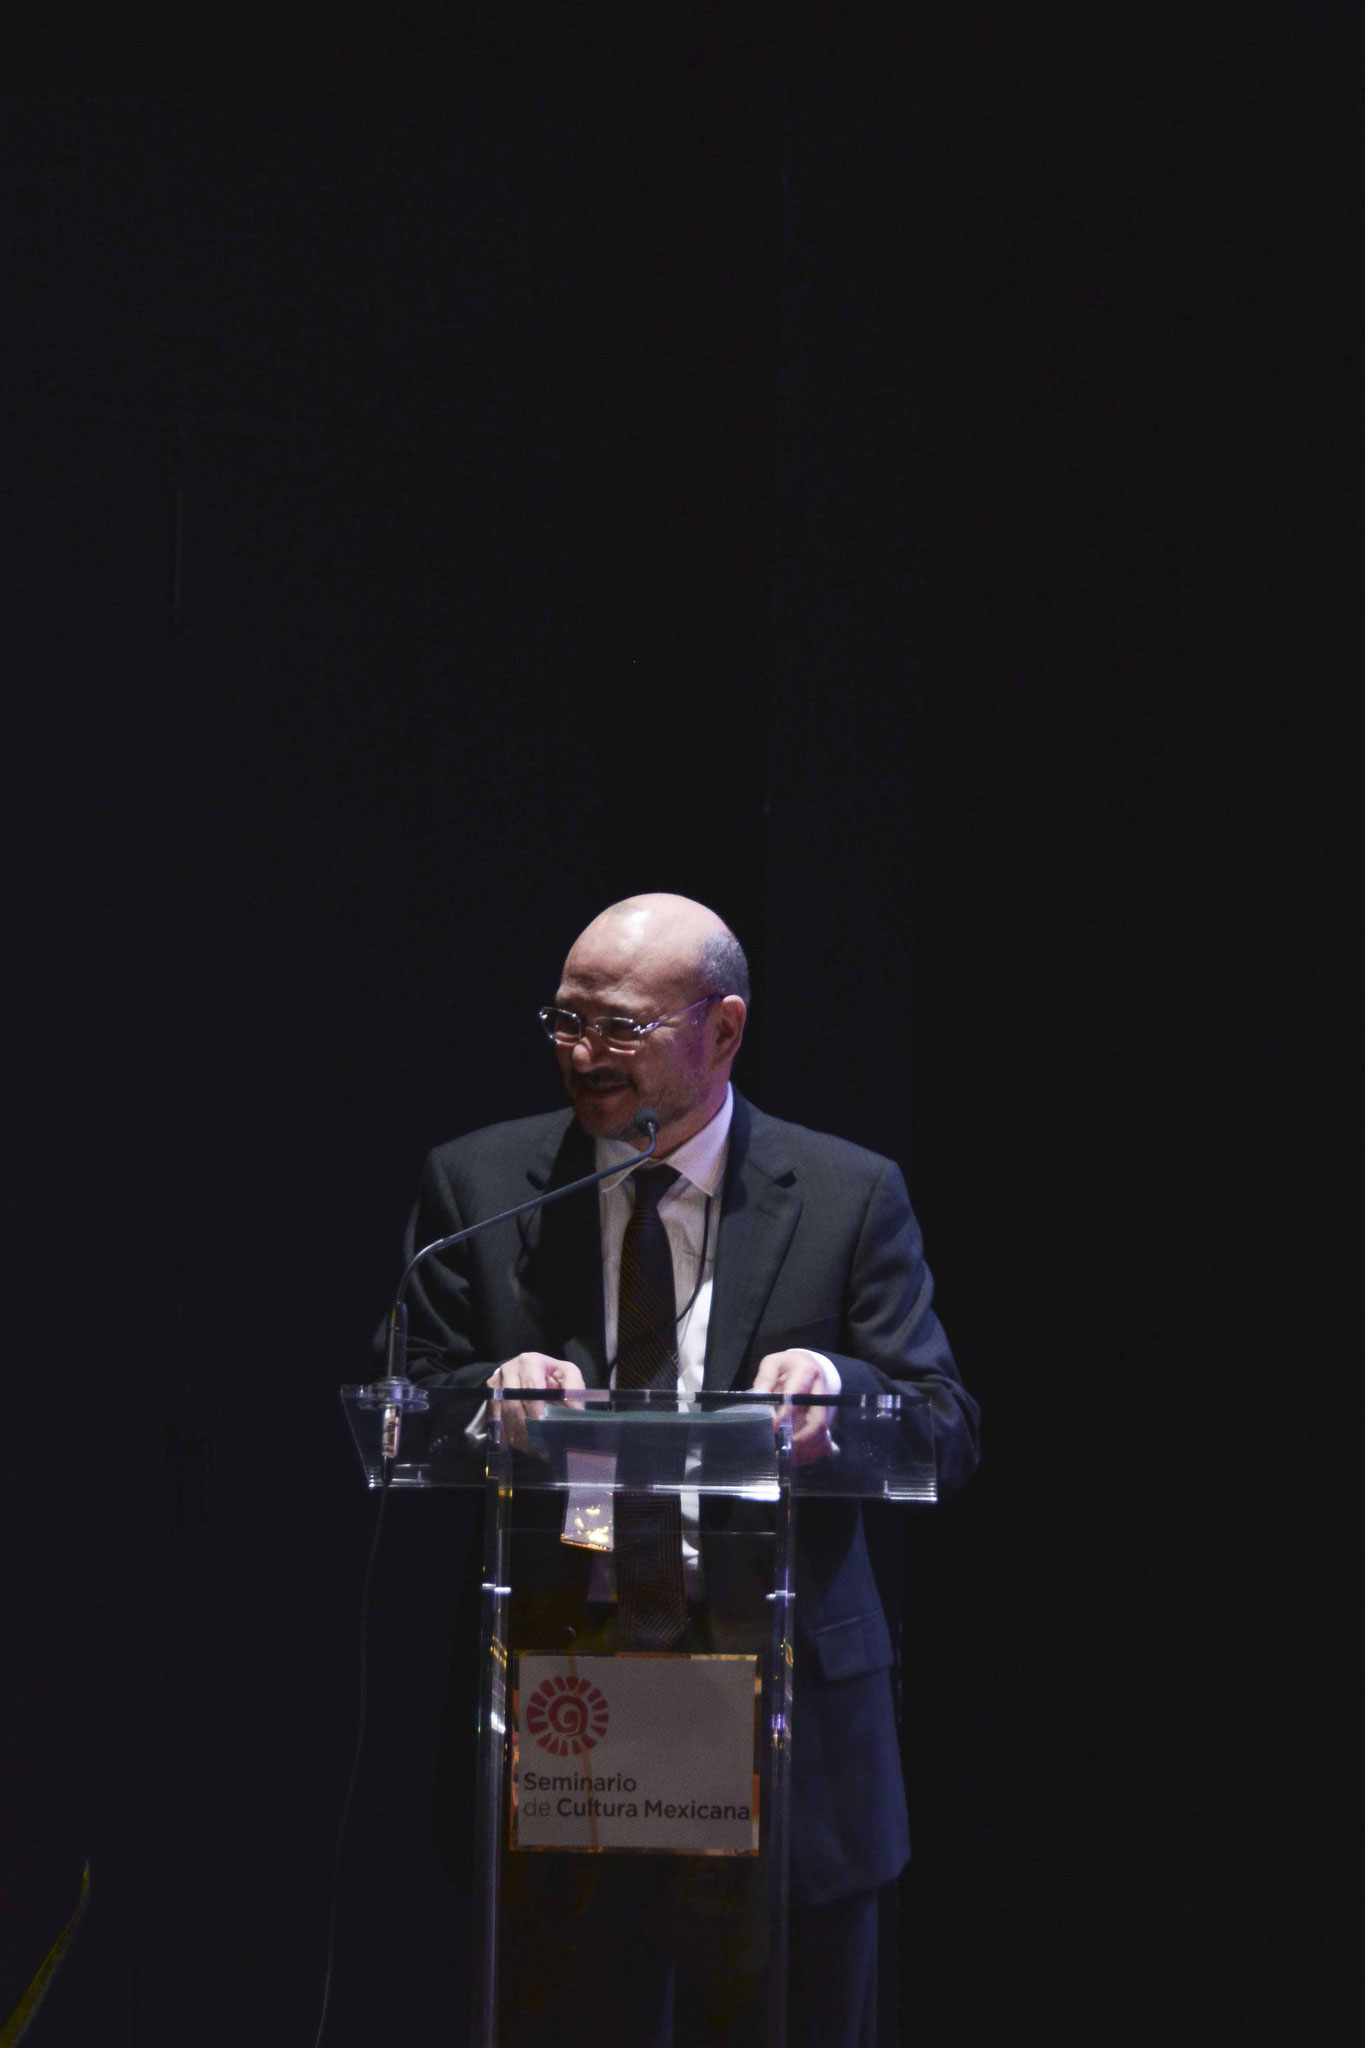 Inauguración Conferencia Regional IFLA Américas / Dr. Saúl Alcántara